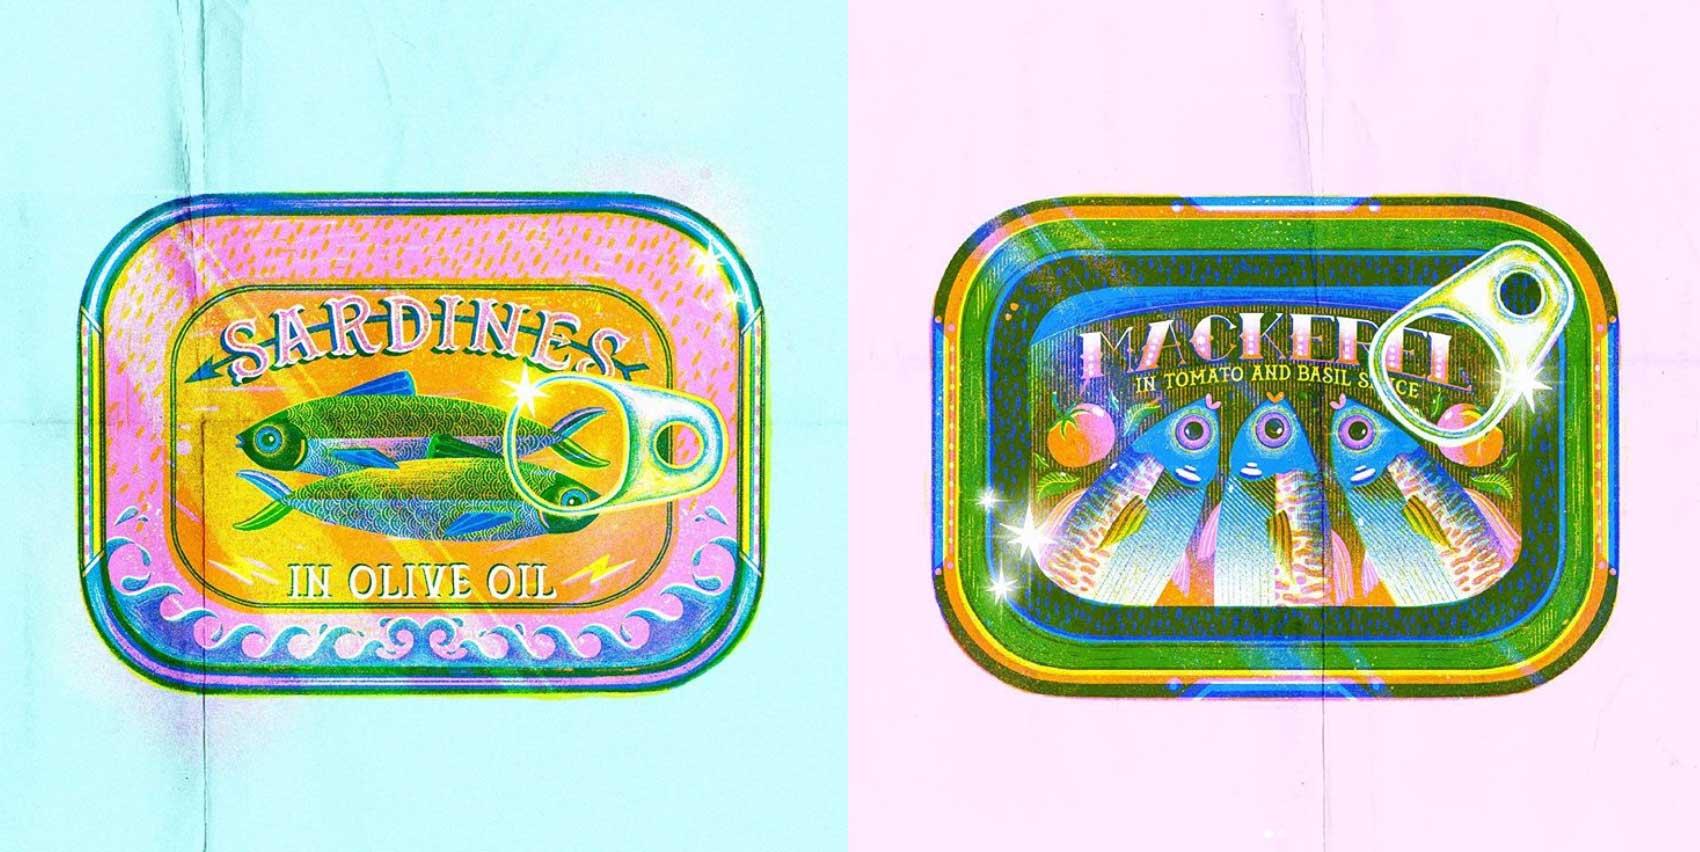 jasmine floyd risograph print fish tins